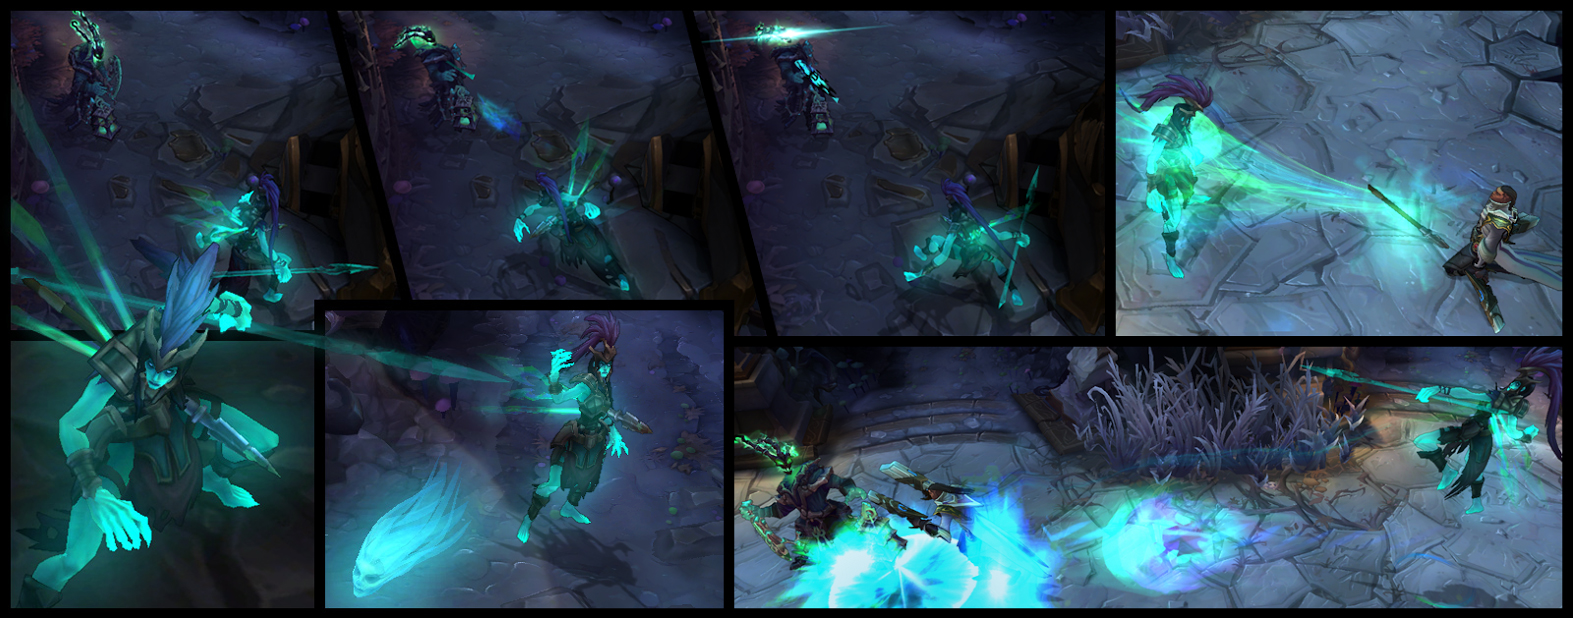 File:Kalista Screens 1 jpg - Leaguepedia | League of Legends Esports